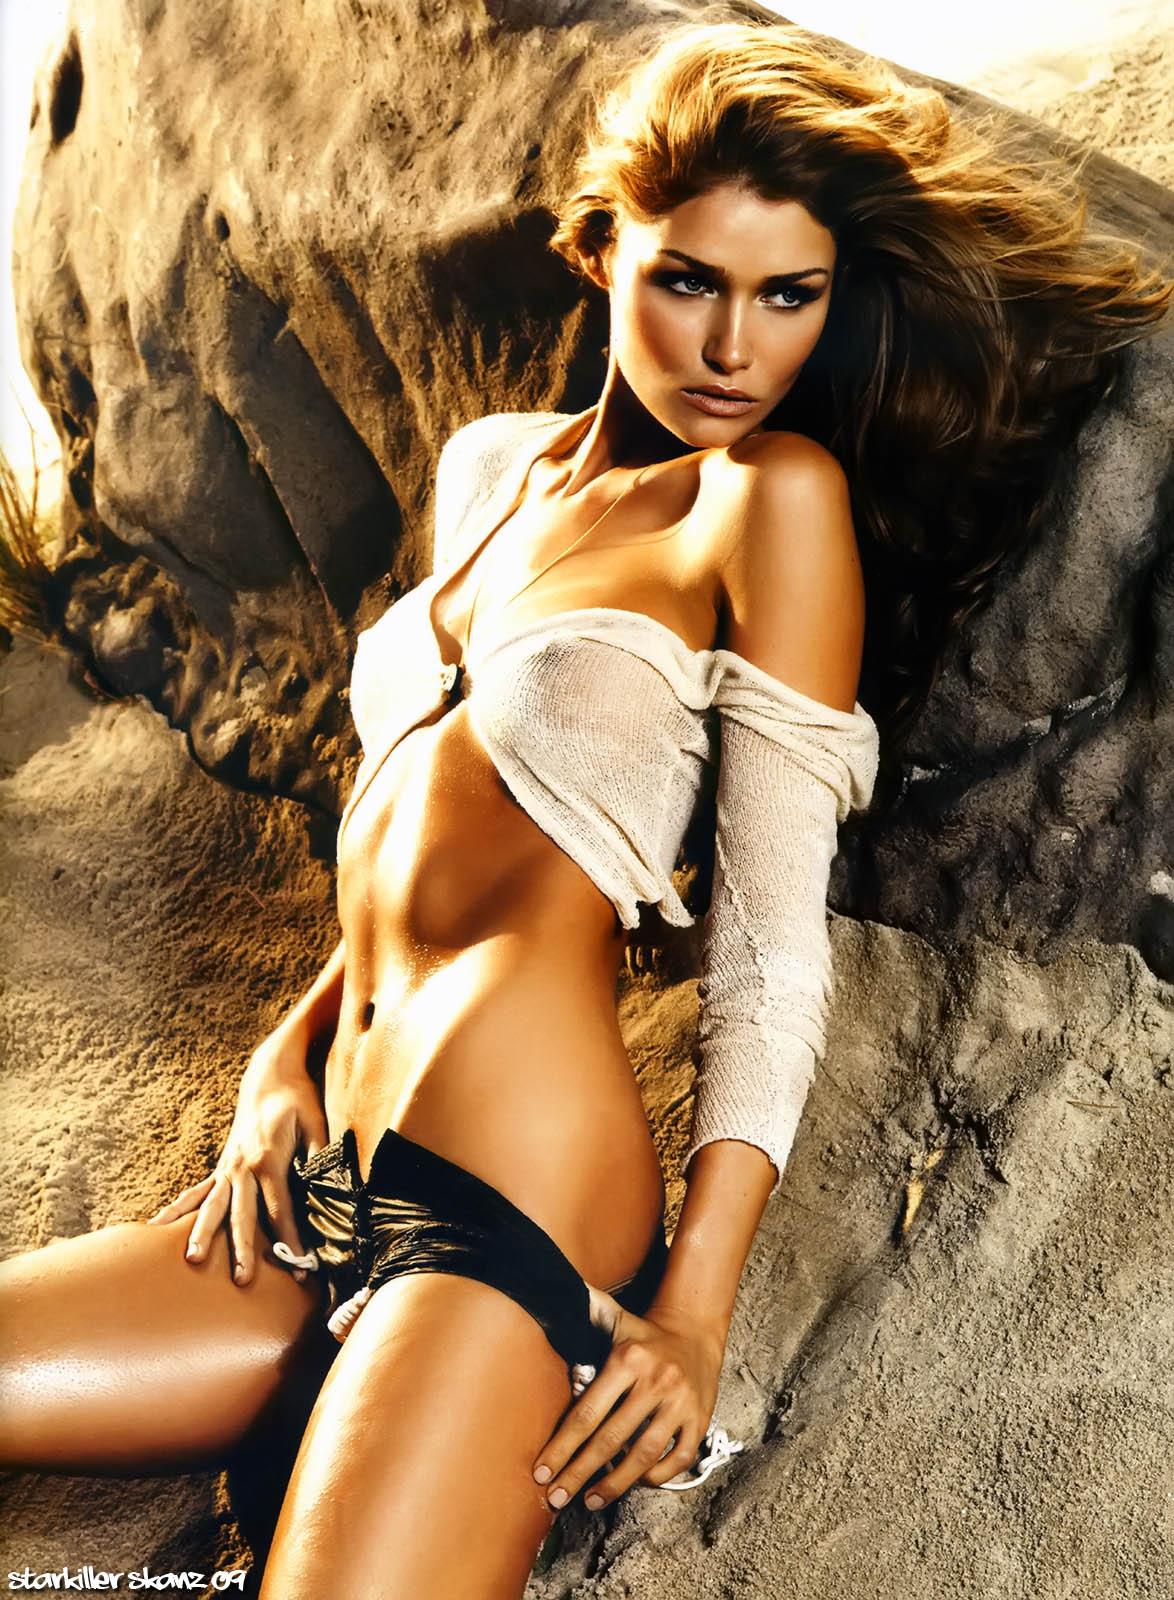 Young Sarah Mutch nude (19 photo), Hot